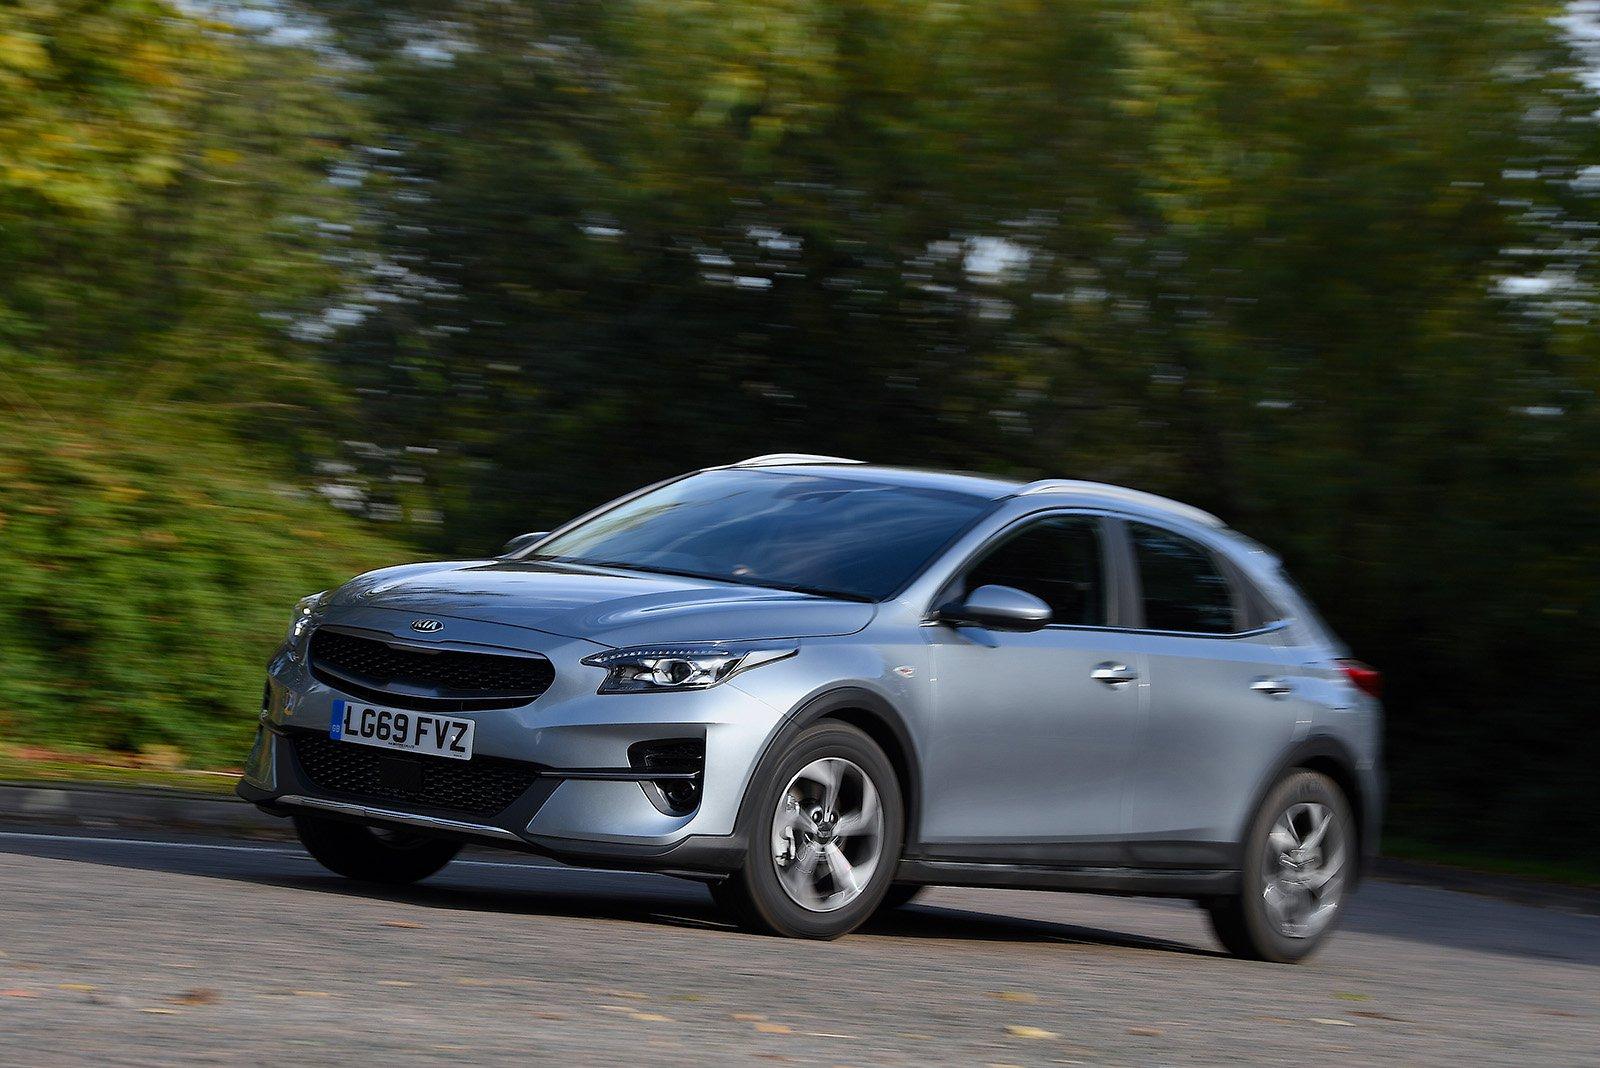 Kia Xceed long-term test review